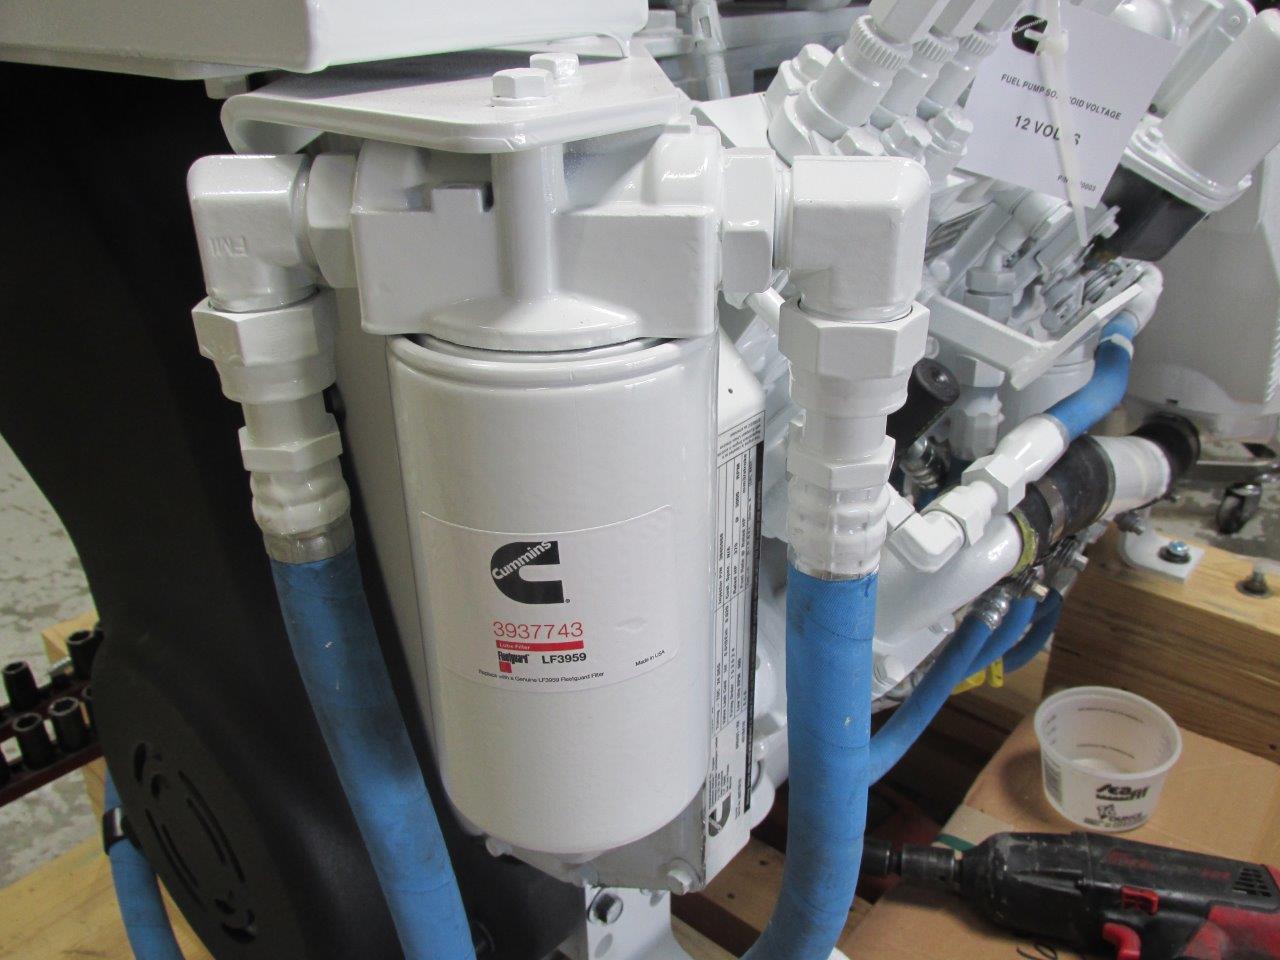 hight resolution of remote oil filter kit for cummins marine 6bta seaboard marineremote oil filter kit